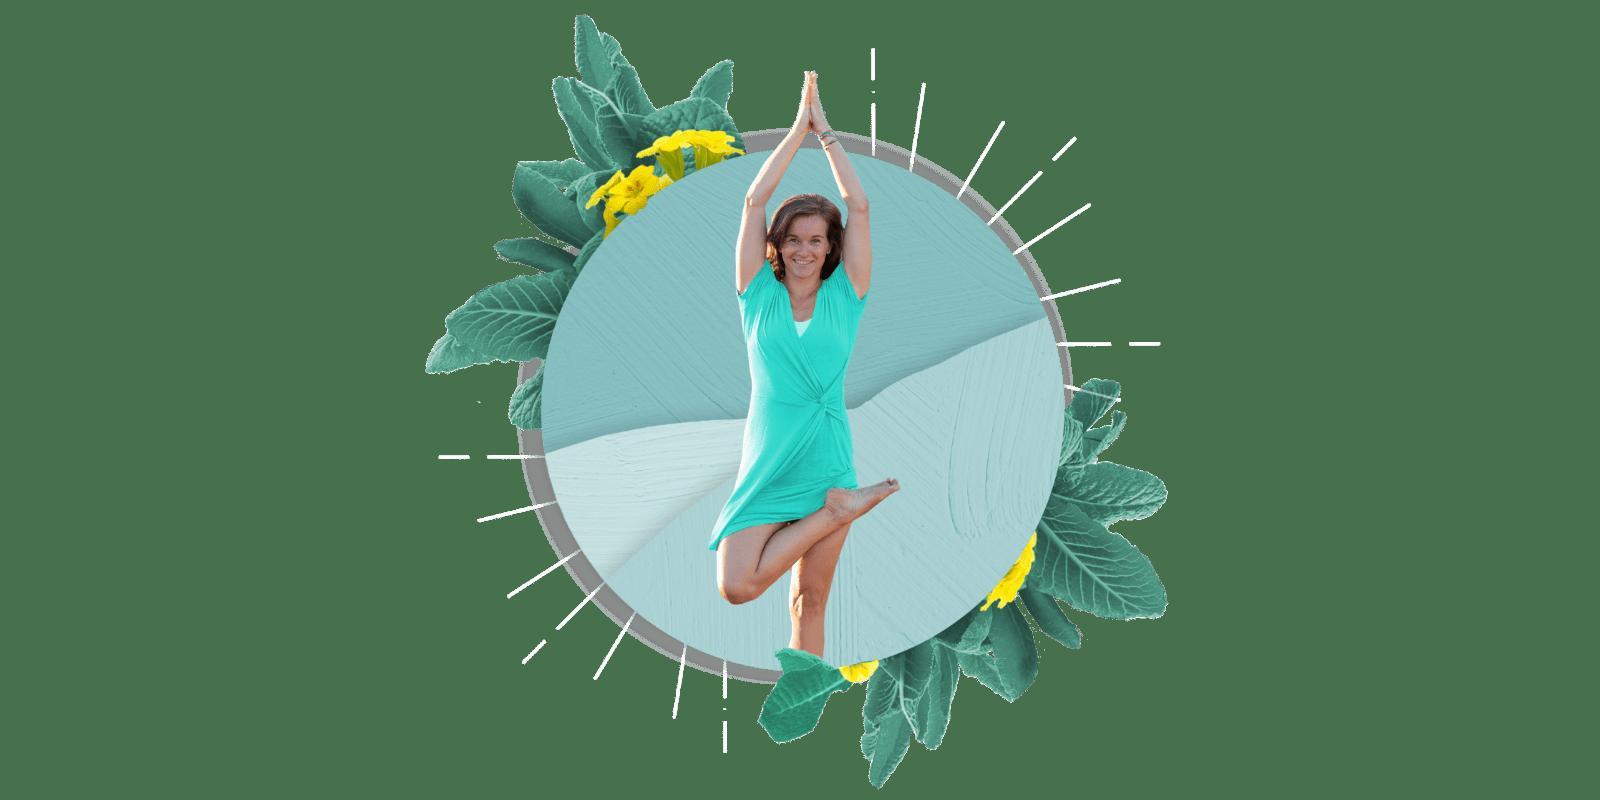 Nancy in Yoga Pose Collage